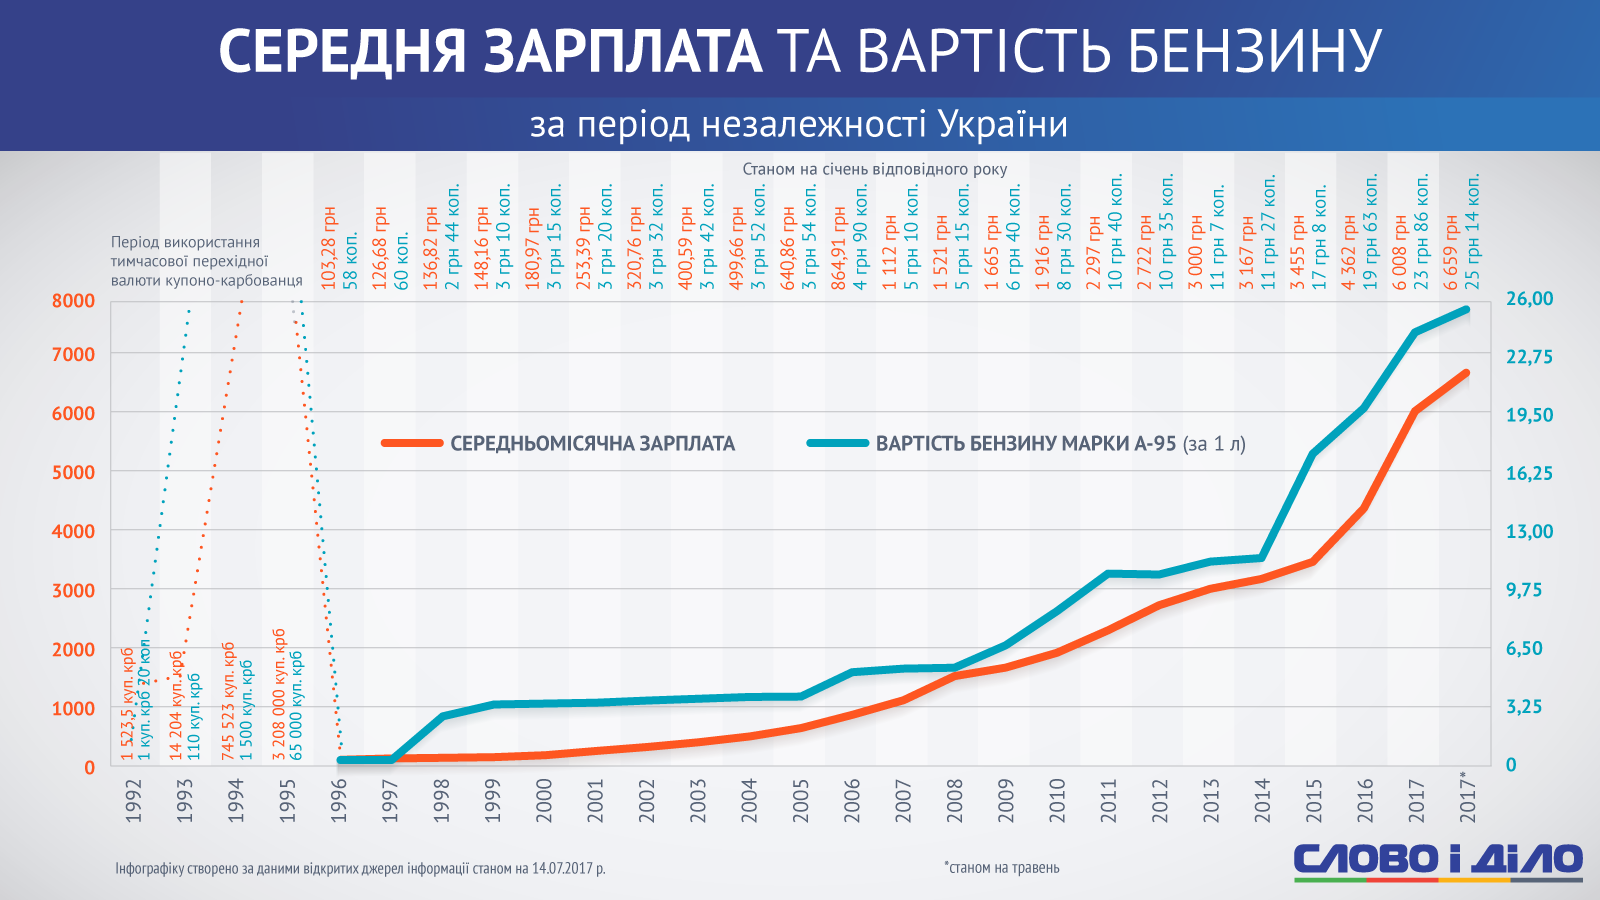 https://media.slovoidilo.ua/media/infographics/5/40544/40544-1_ru_origin.png